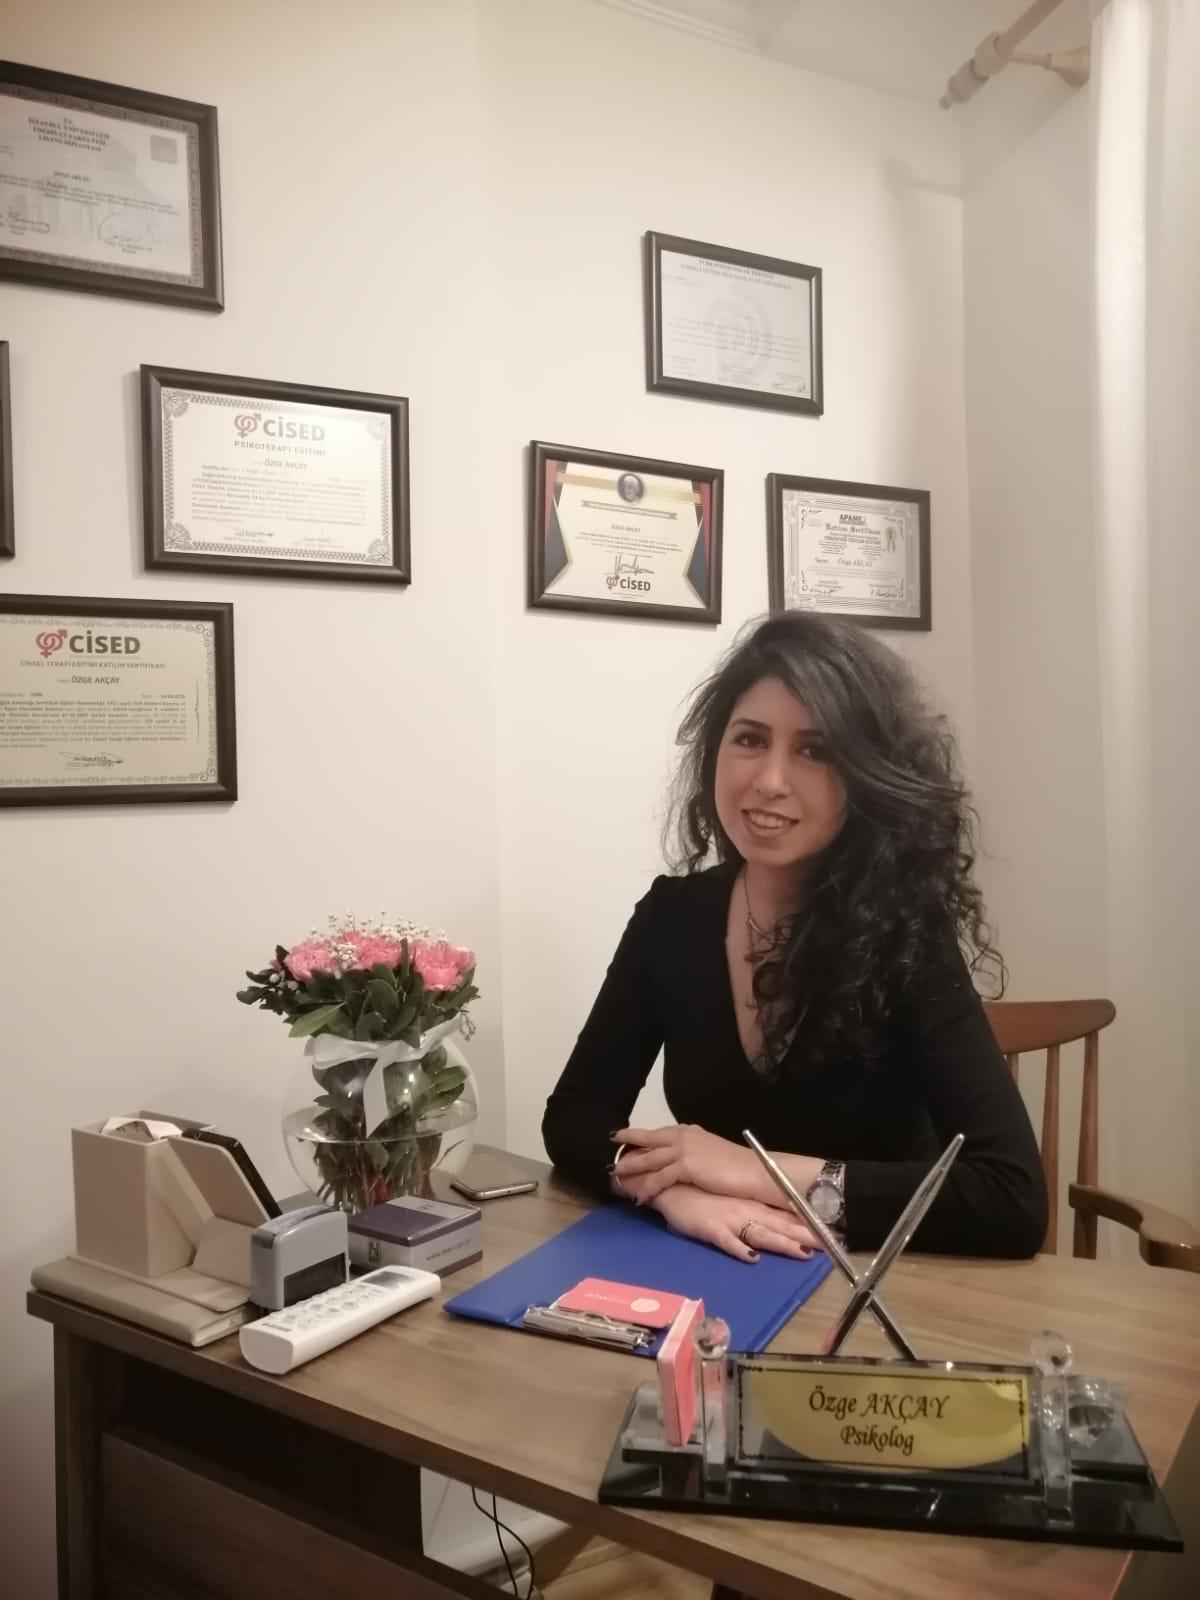 Gaziosmanpaşa - Uzman Psikolog Özge Akçay